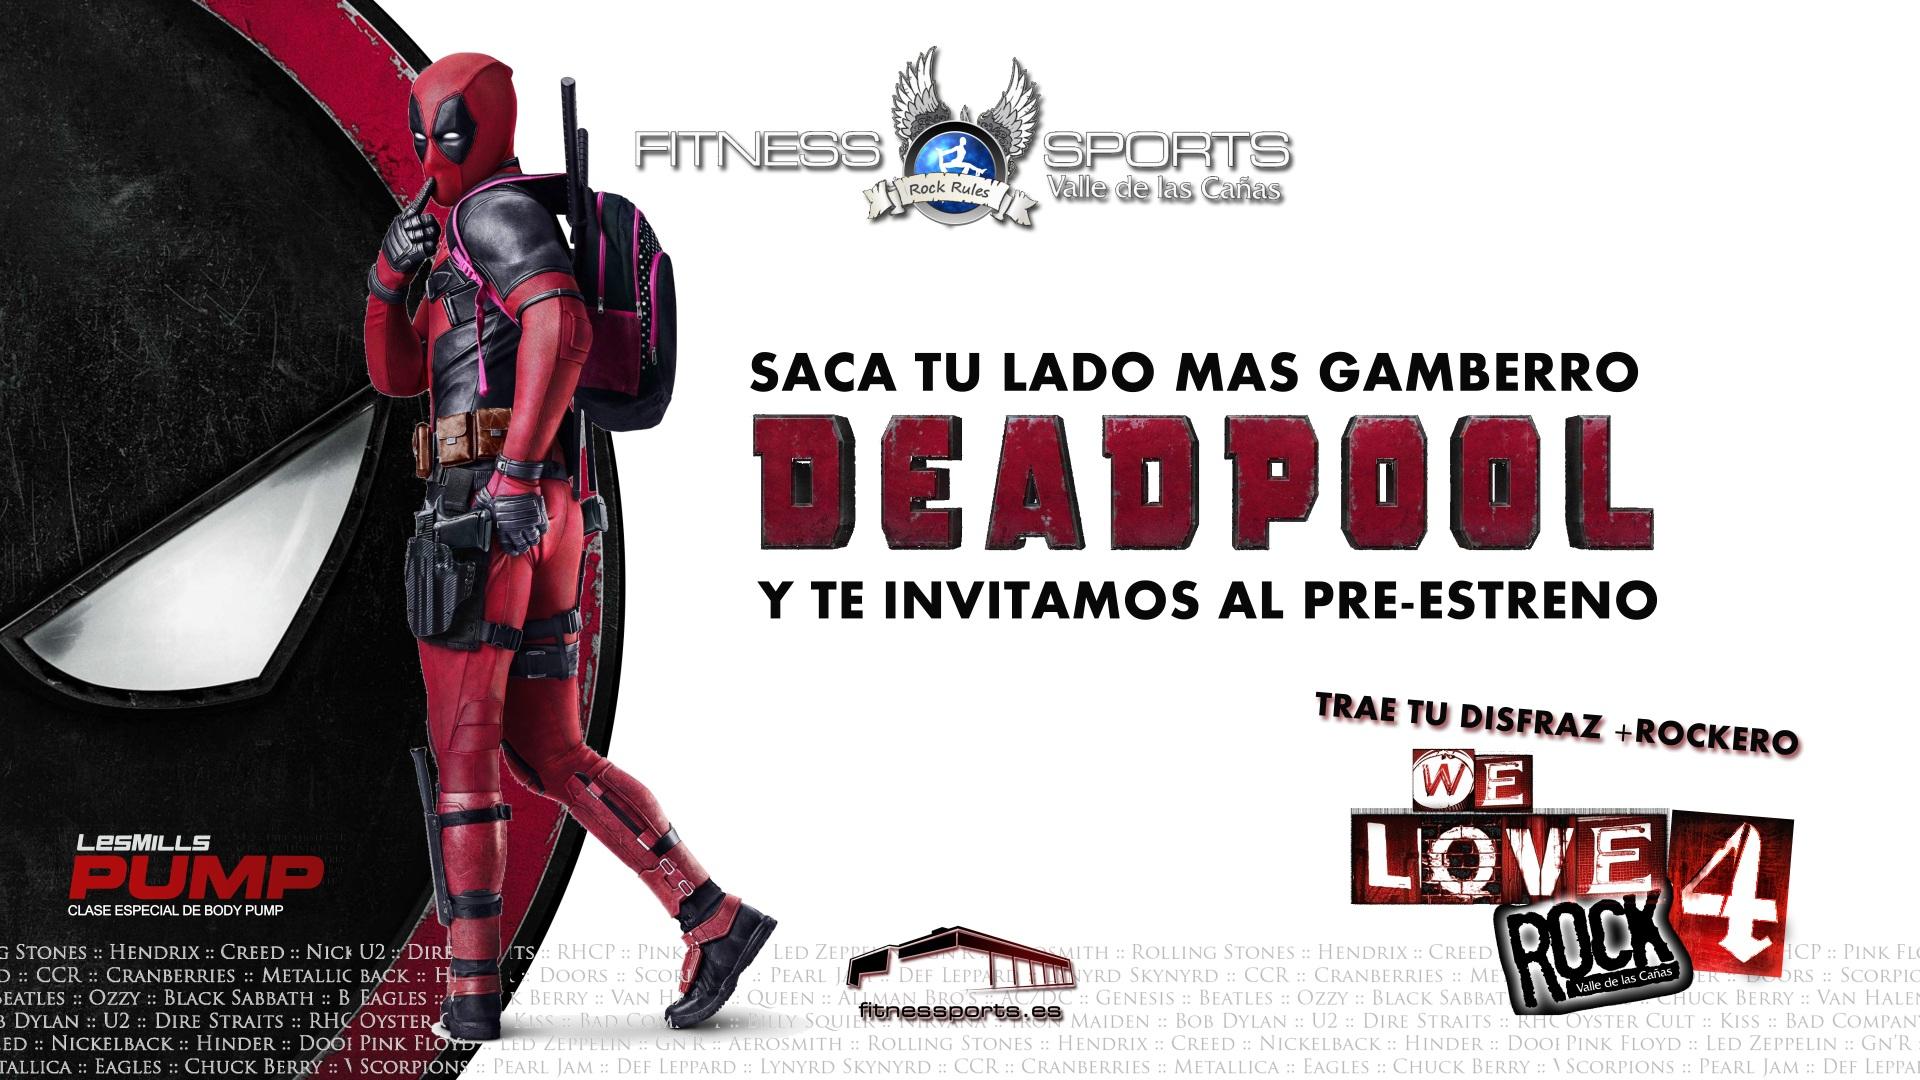 https://www.perfectpixel.es/wp-content/uploads/2016/02/Cartel-Deadpool-Film-Poster-Body-Pump-Rock-4-Fitness-Sports-Valle-las-Ca%C3%B1as-Advertisement.jpg